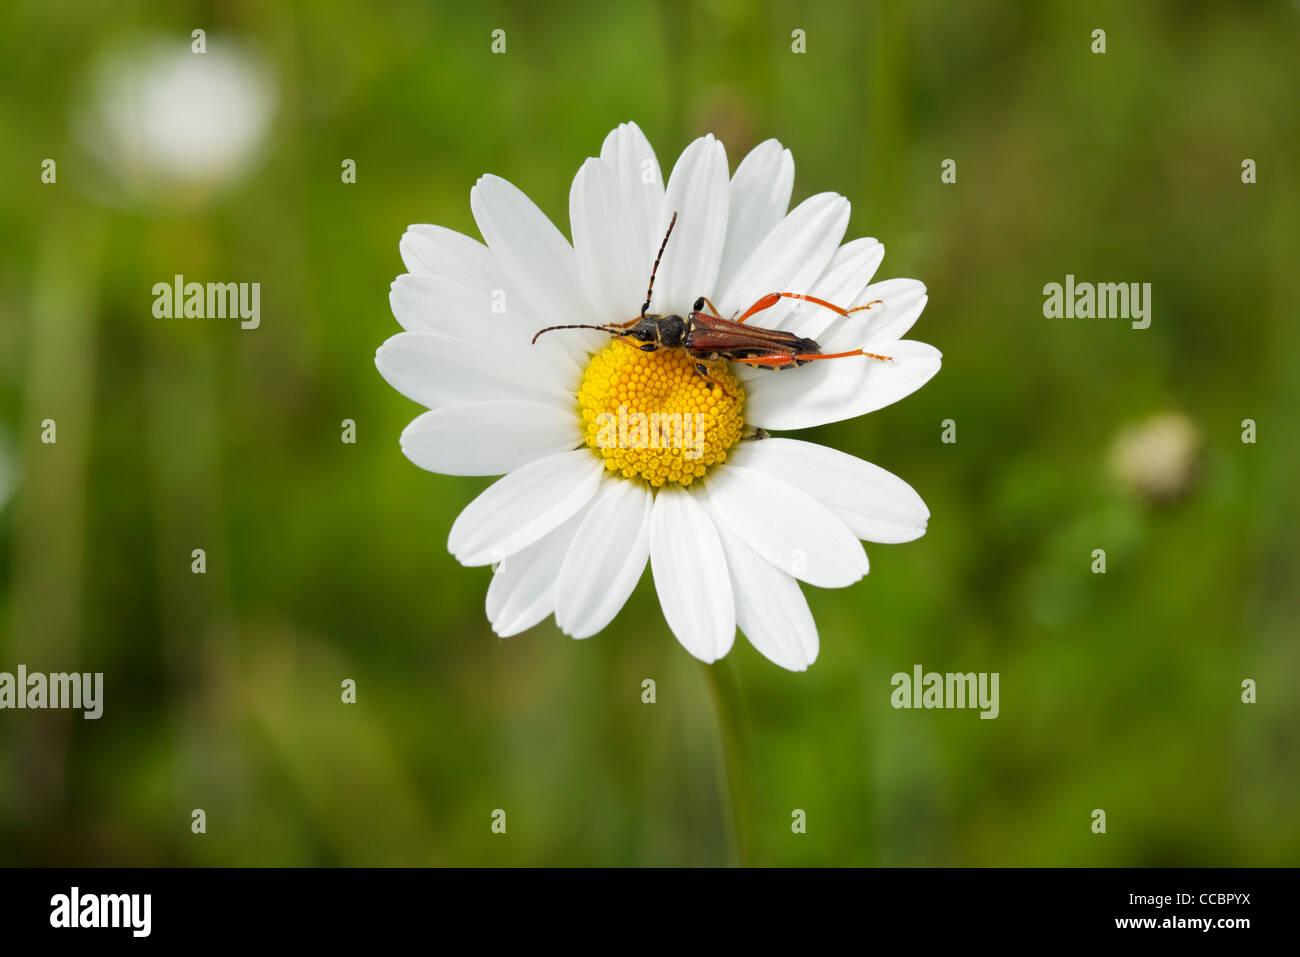 Longhorn beetle on daisy - Stock Image